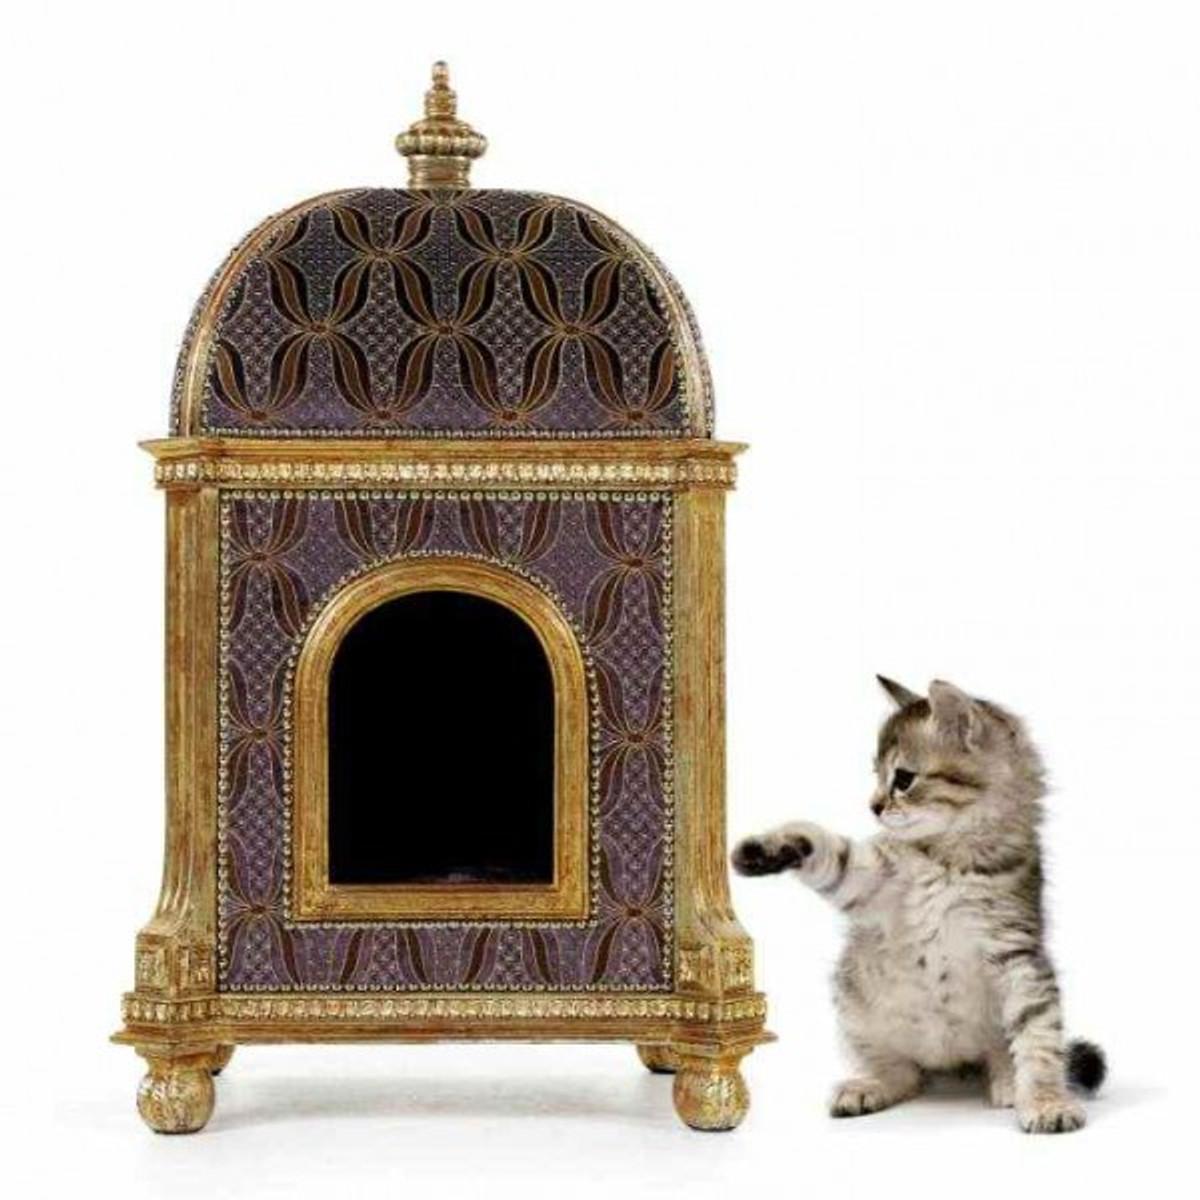 Casa Padrino Baroque Luxury Cat House Golden Temple   House Seat Cat  Furniture Pet Furniture. Loading Zoom